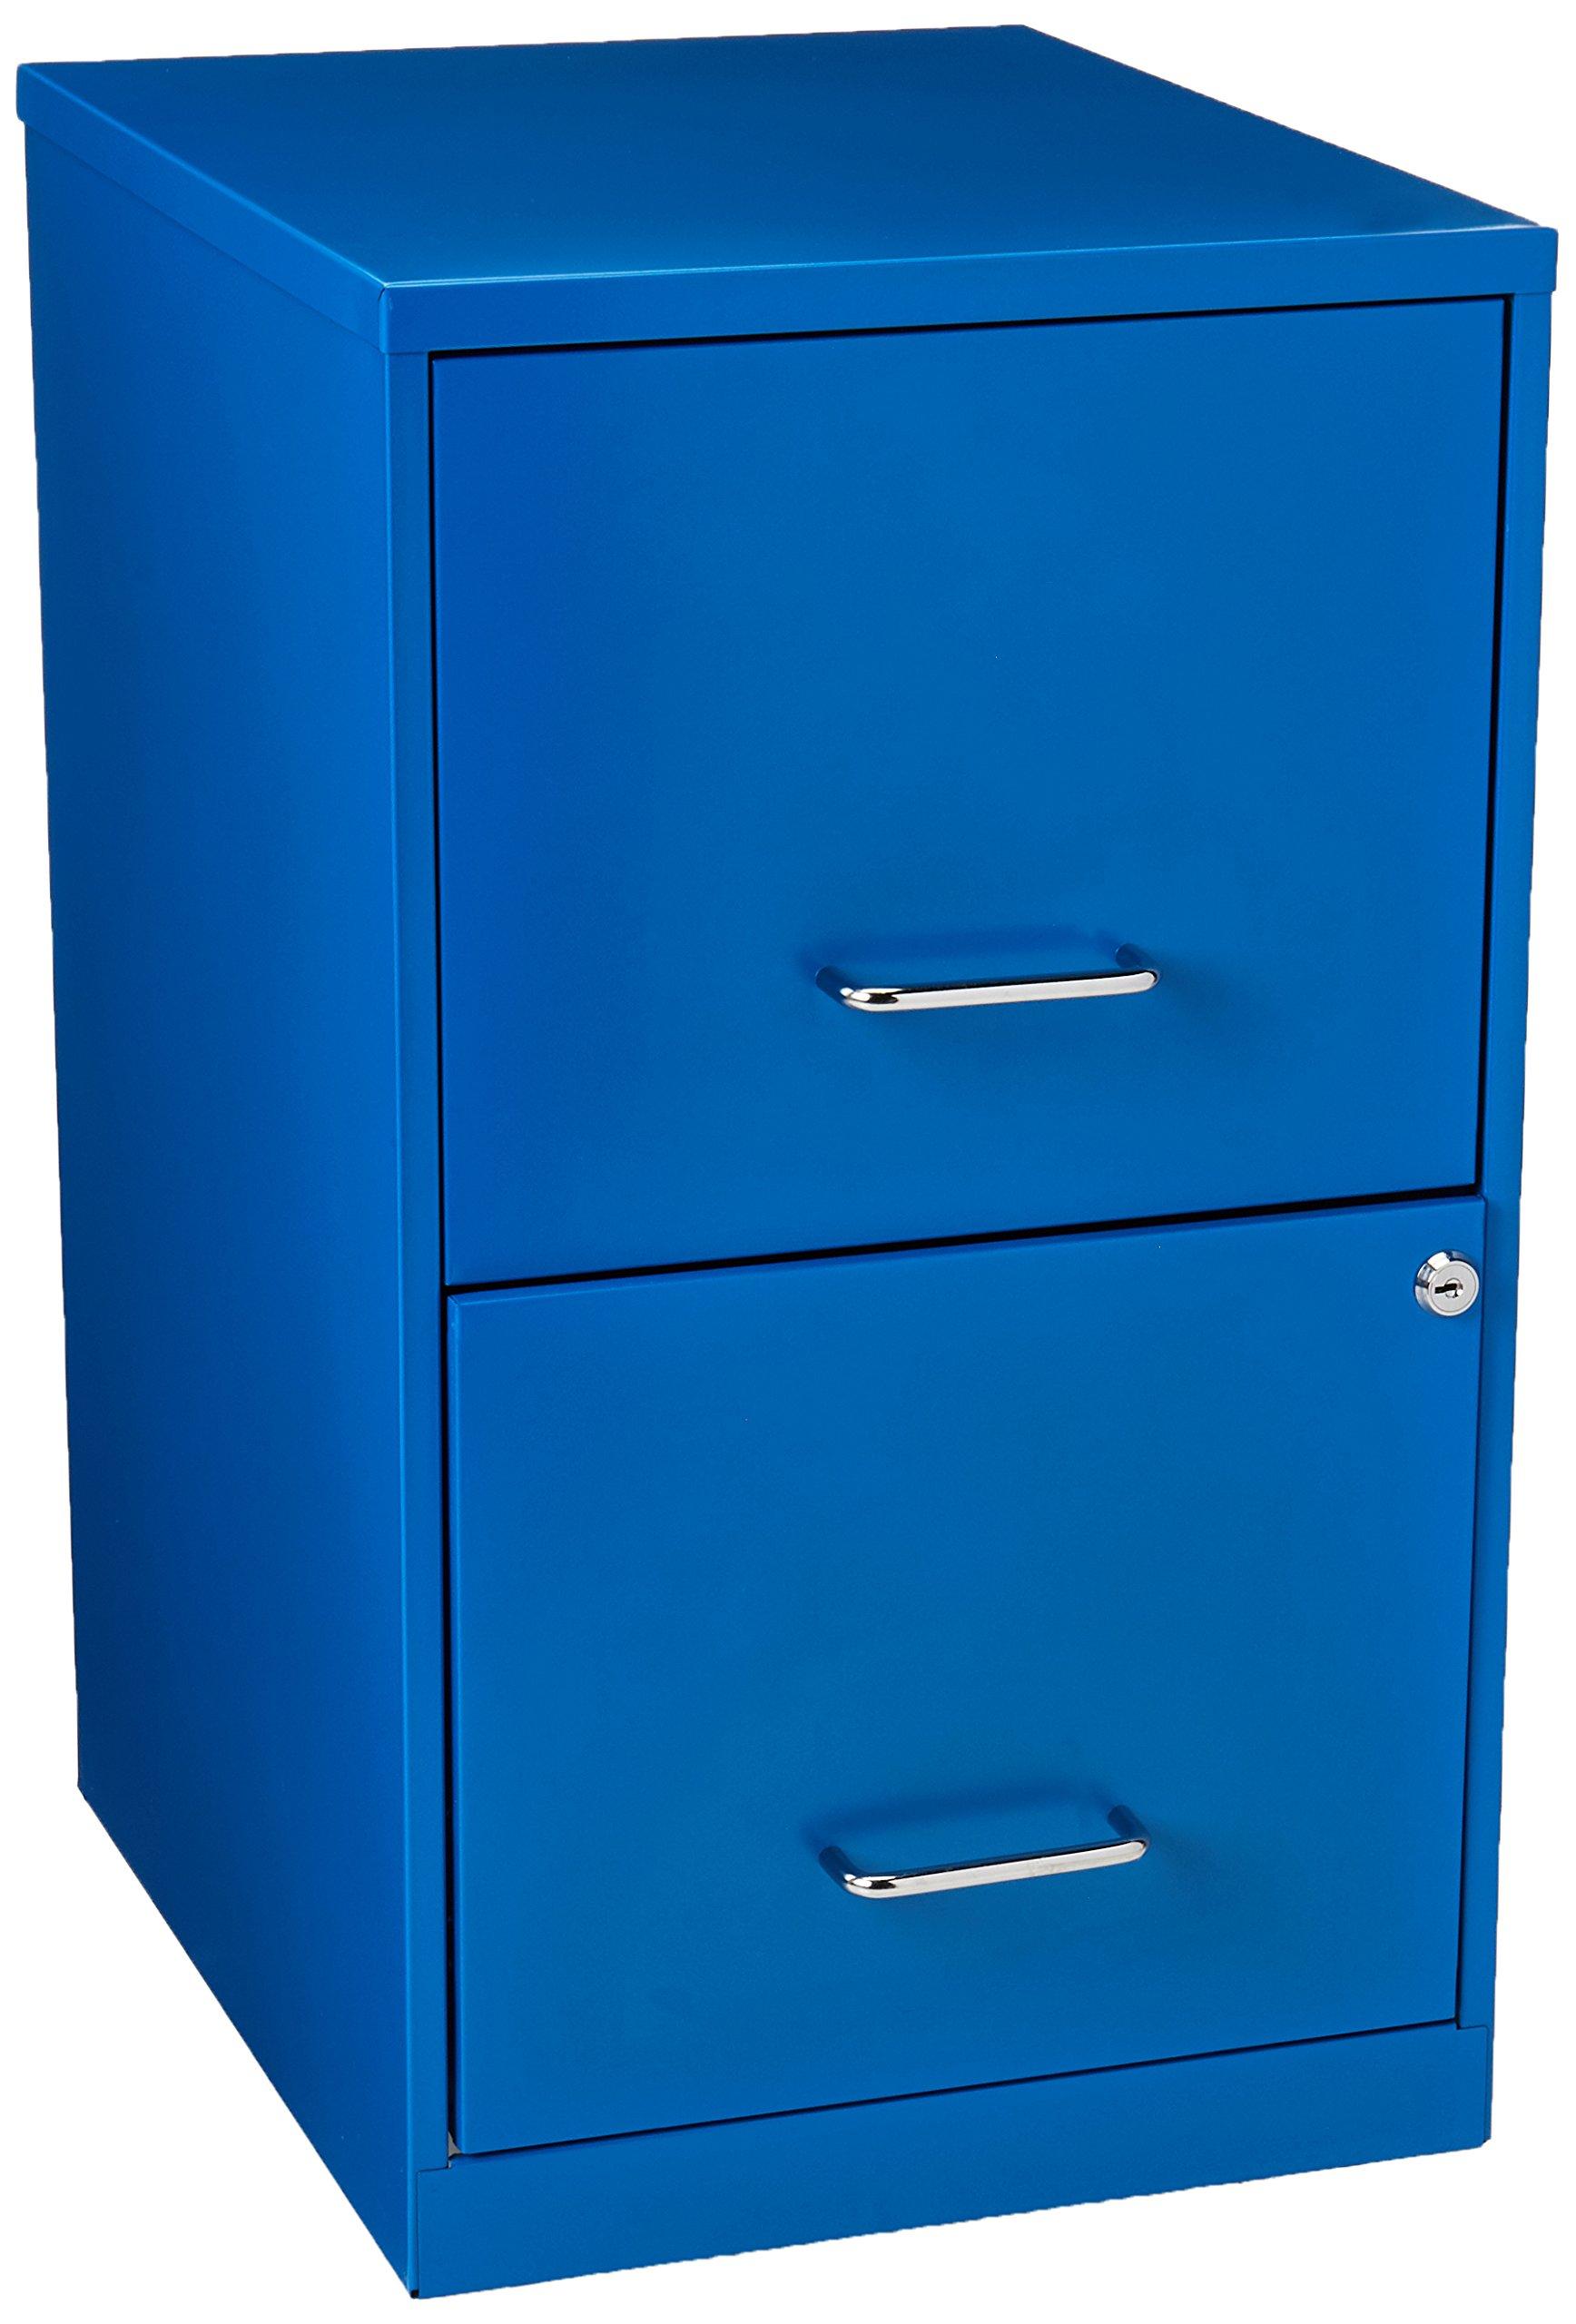 Hirsh SOHO 2 Drawer File Cabinet in Blue by Hirsh Industries